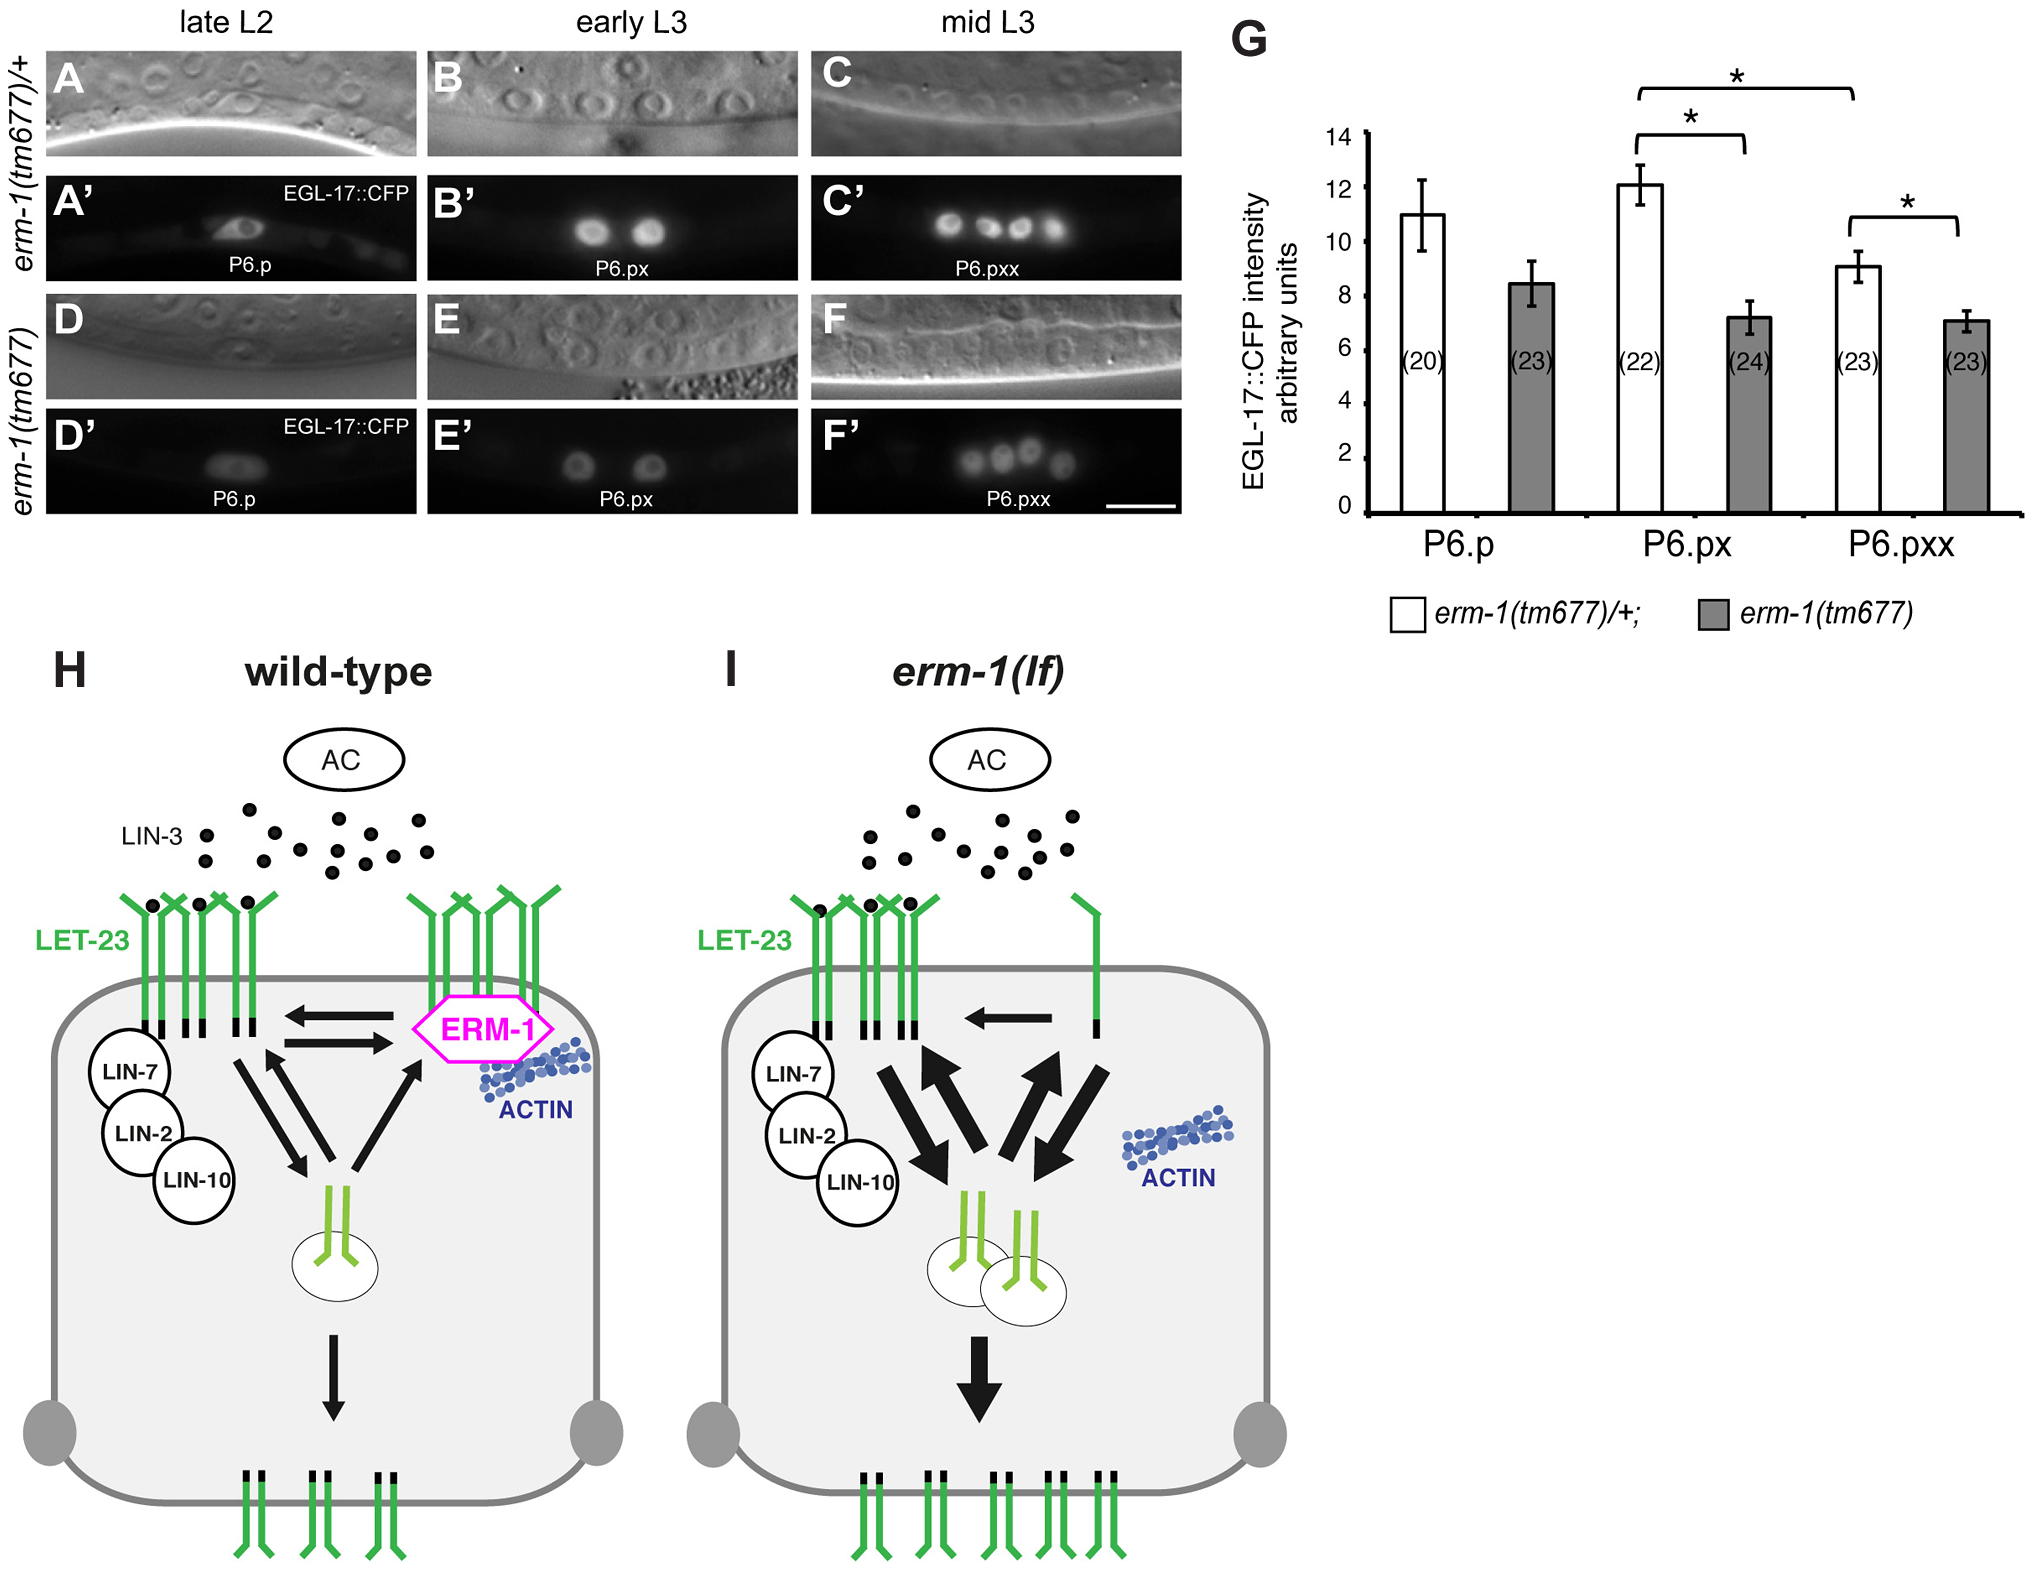 Temporal regulation of LET-23 EGFR signaling by ERM-1.